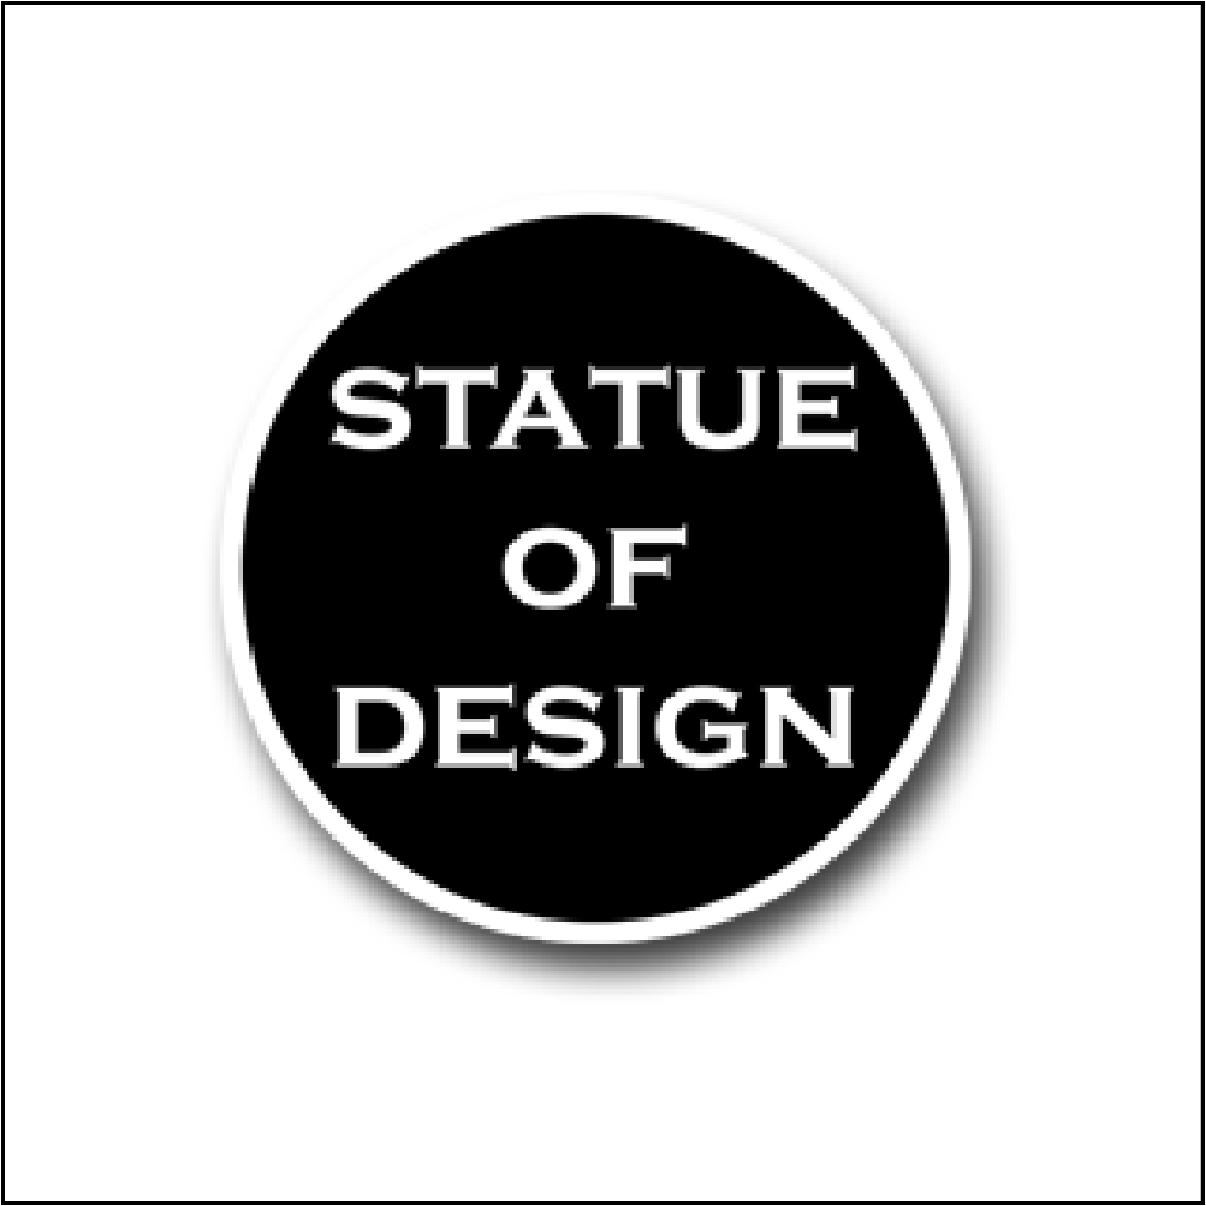 statueofdesign.png